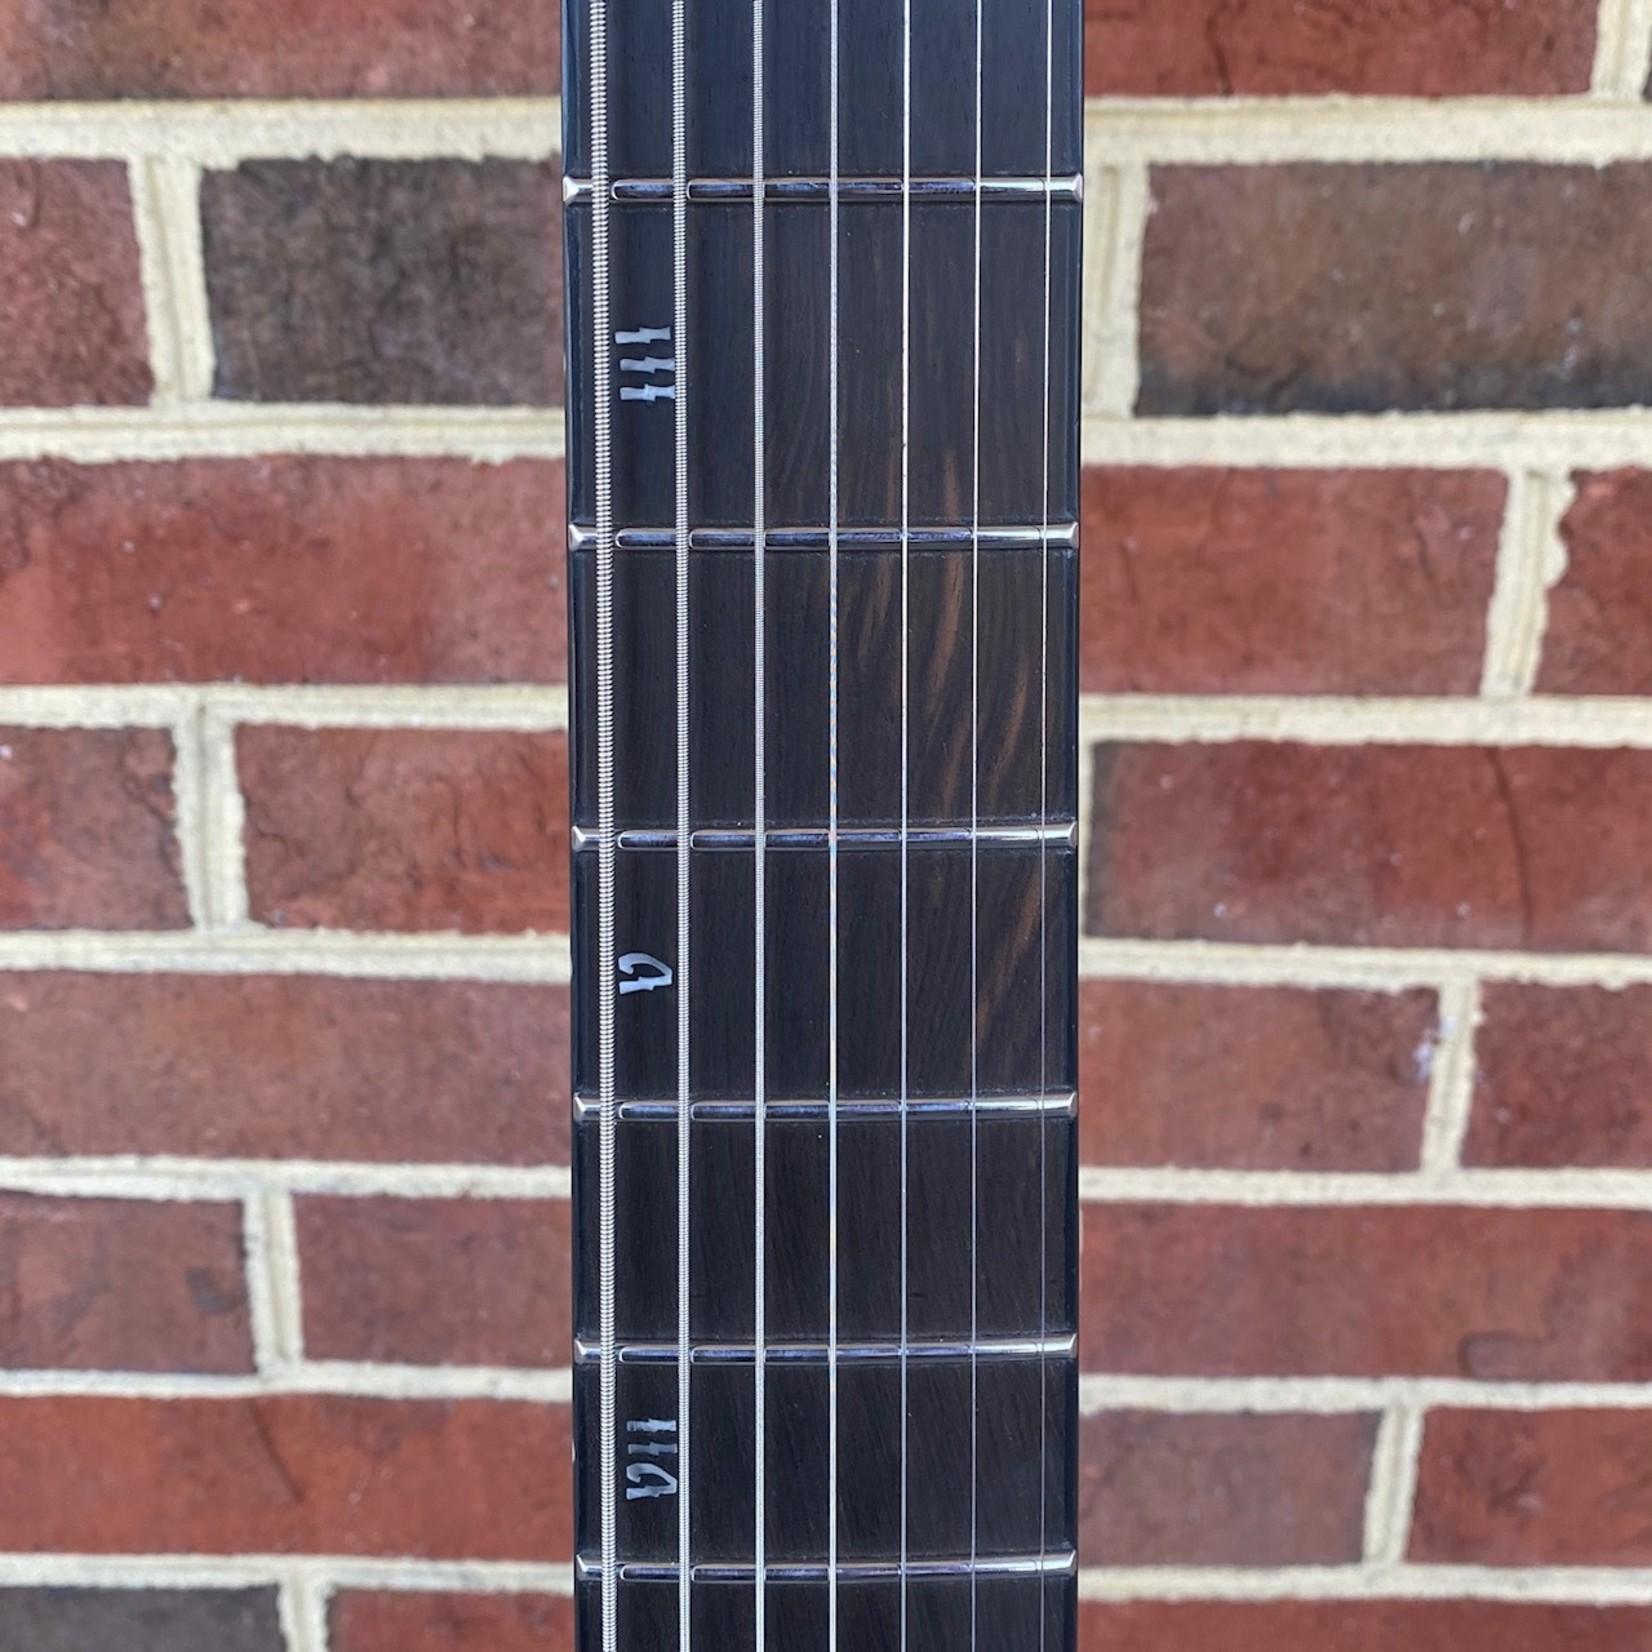 "Schecter Guitar Research Schecter Banshee Mach-7 EB, Ember Burst, 7-String, Lundgren M7 pickups, Ebony FB, Locking Tuners, 26.5"" Scale, 12""-16"" Compound Radius"